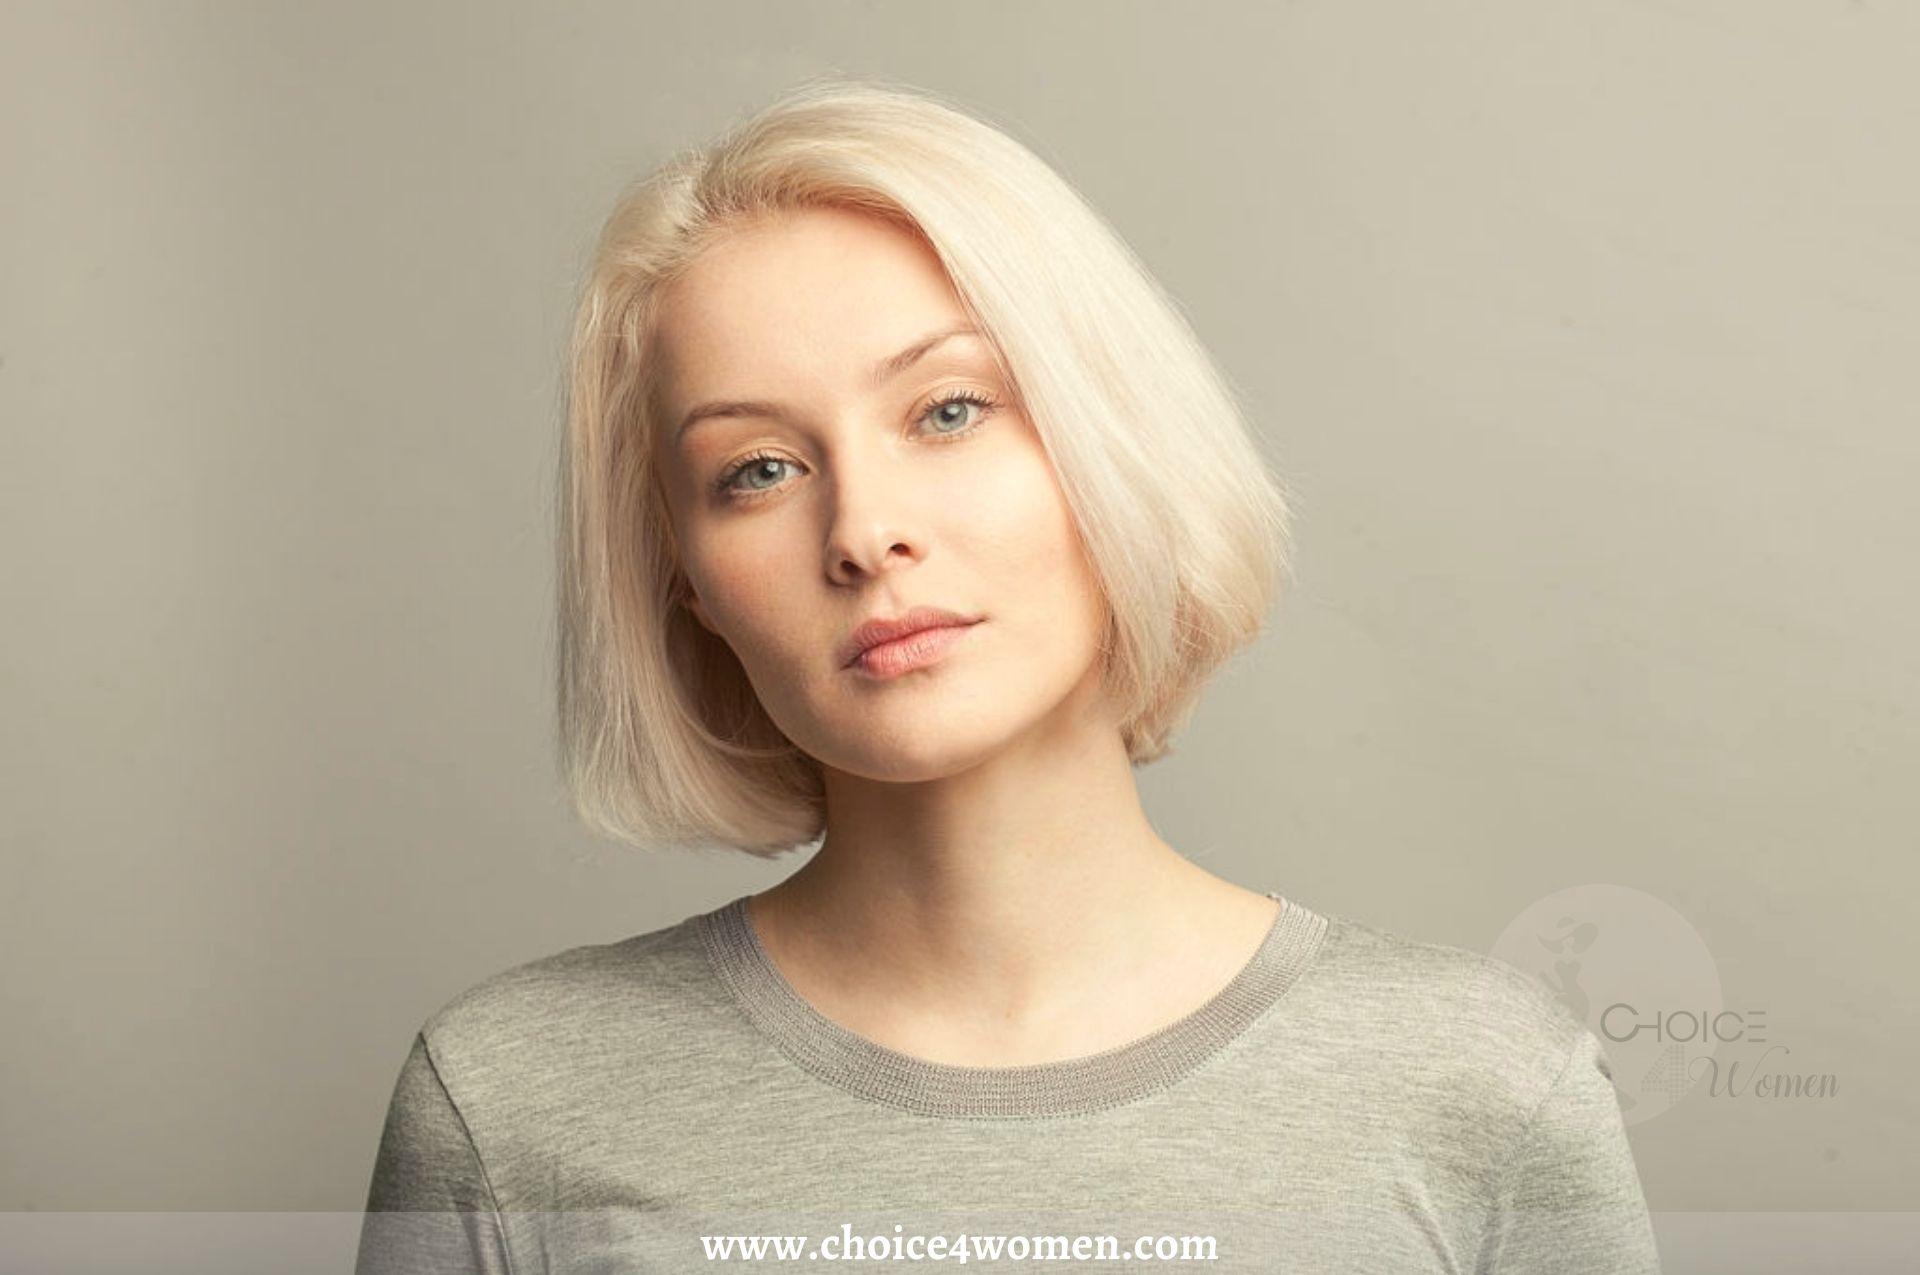 7 Interesting Hacks to Get a Perfect No Makeup Look